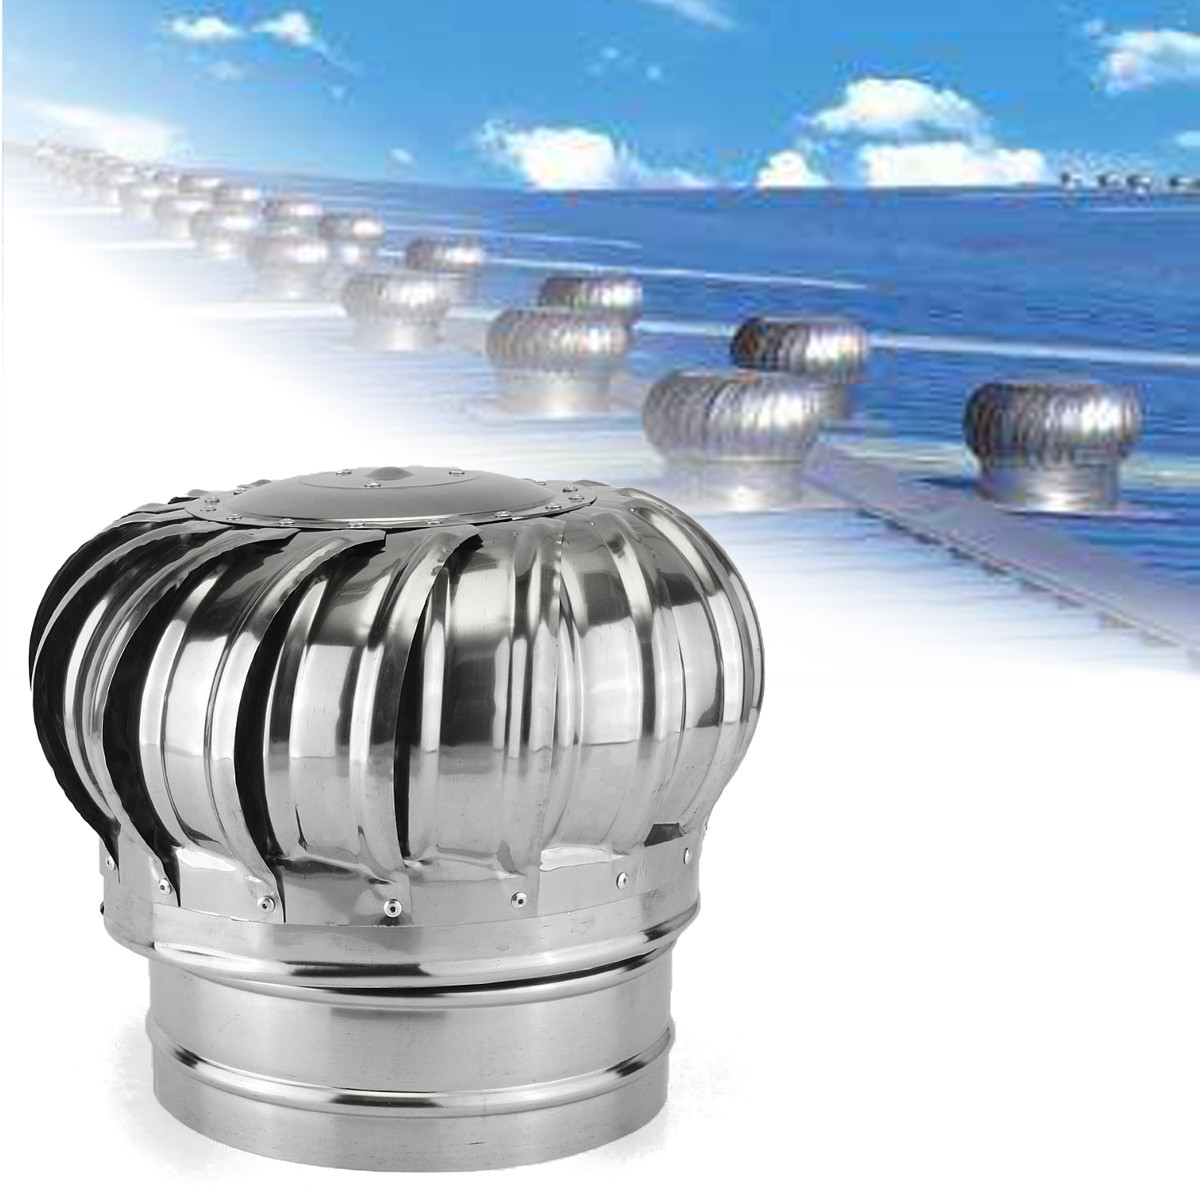 304 Stainless Steel Roof Ventilator Wind Turbines Air Vent Attic Ventilator 110mm 150mm 200mm Pipefit Roof Ventilating Fan